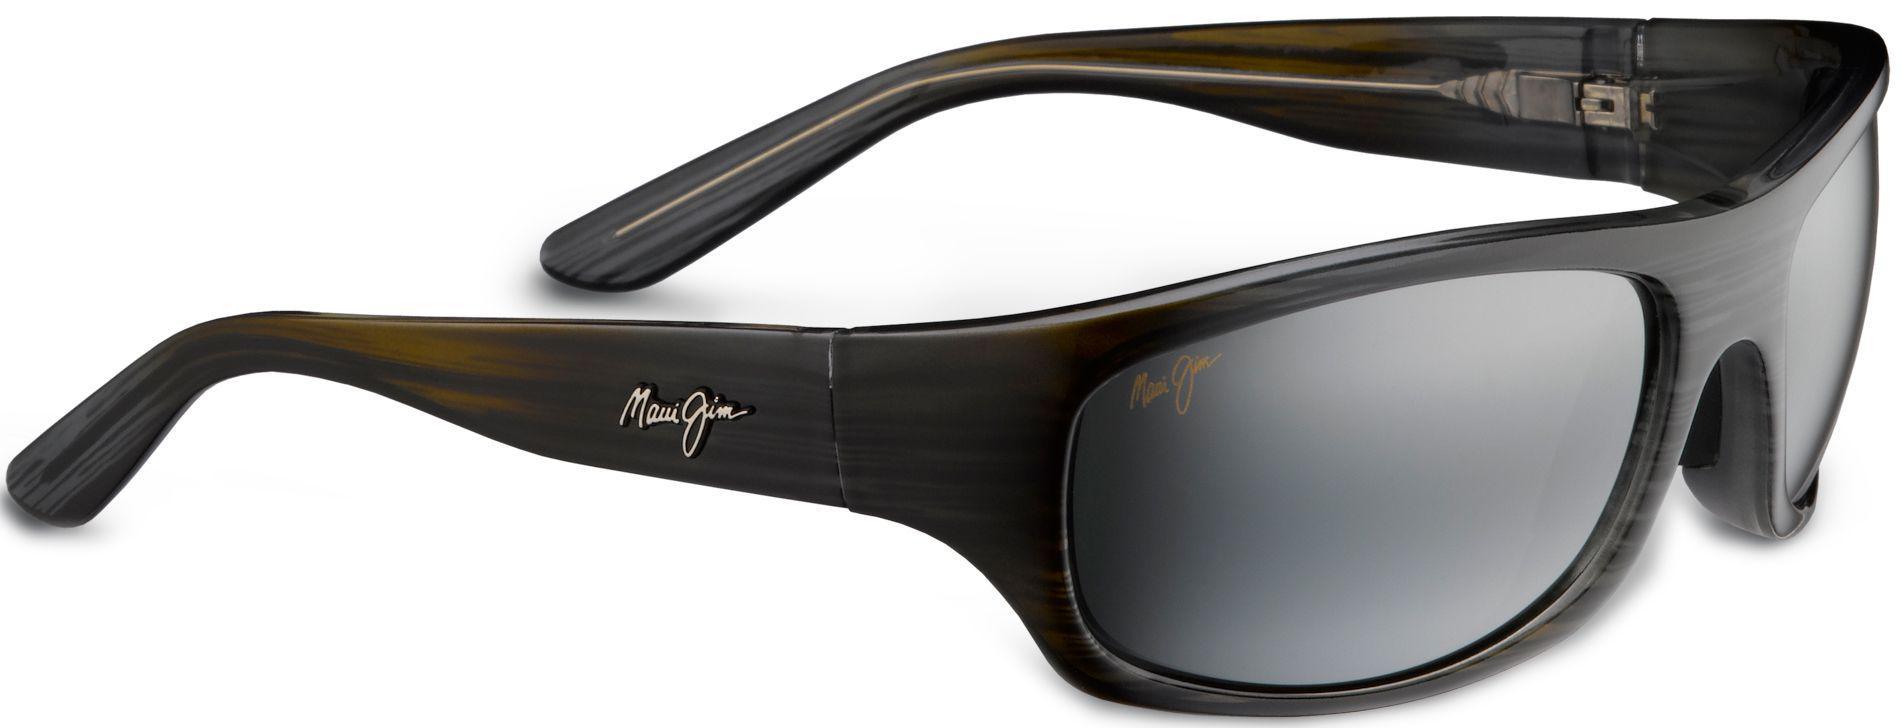 7e1d2f746c1f Lyst - Maui Jim Surf Rider Polarized Sunglasses in Black for Men